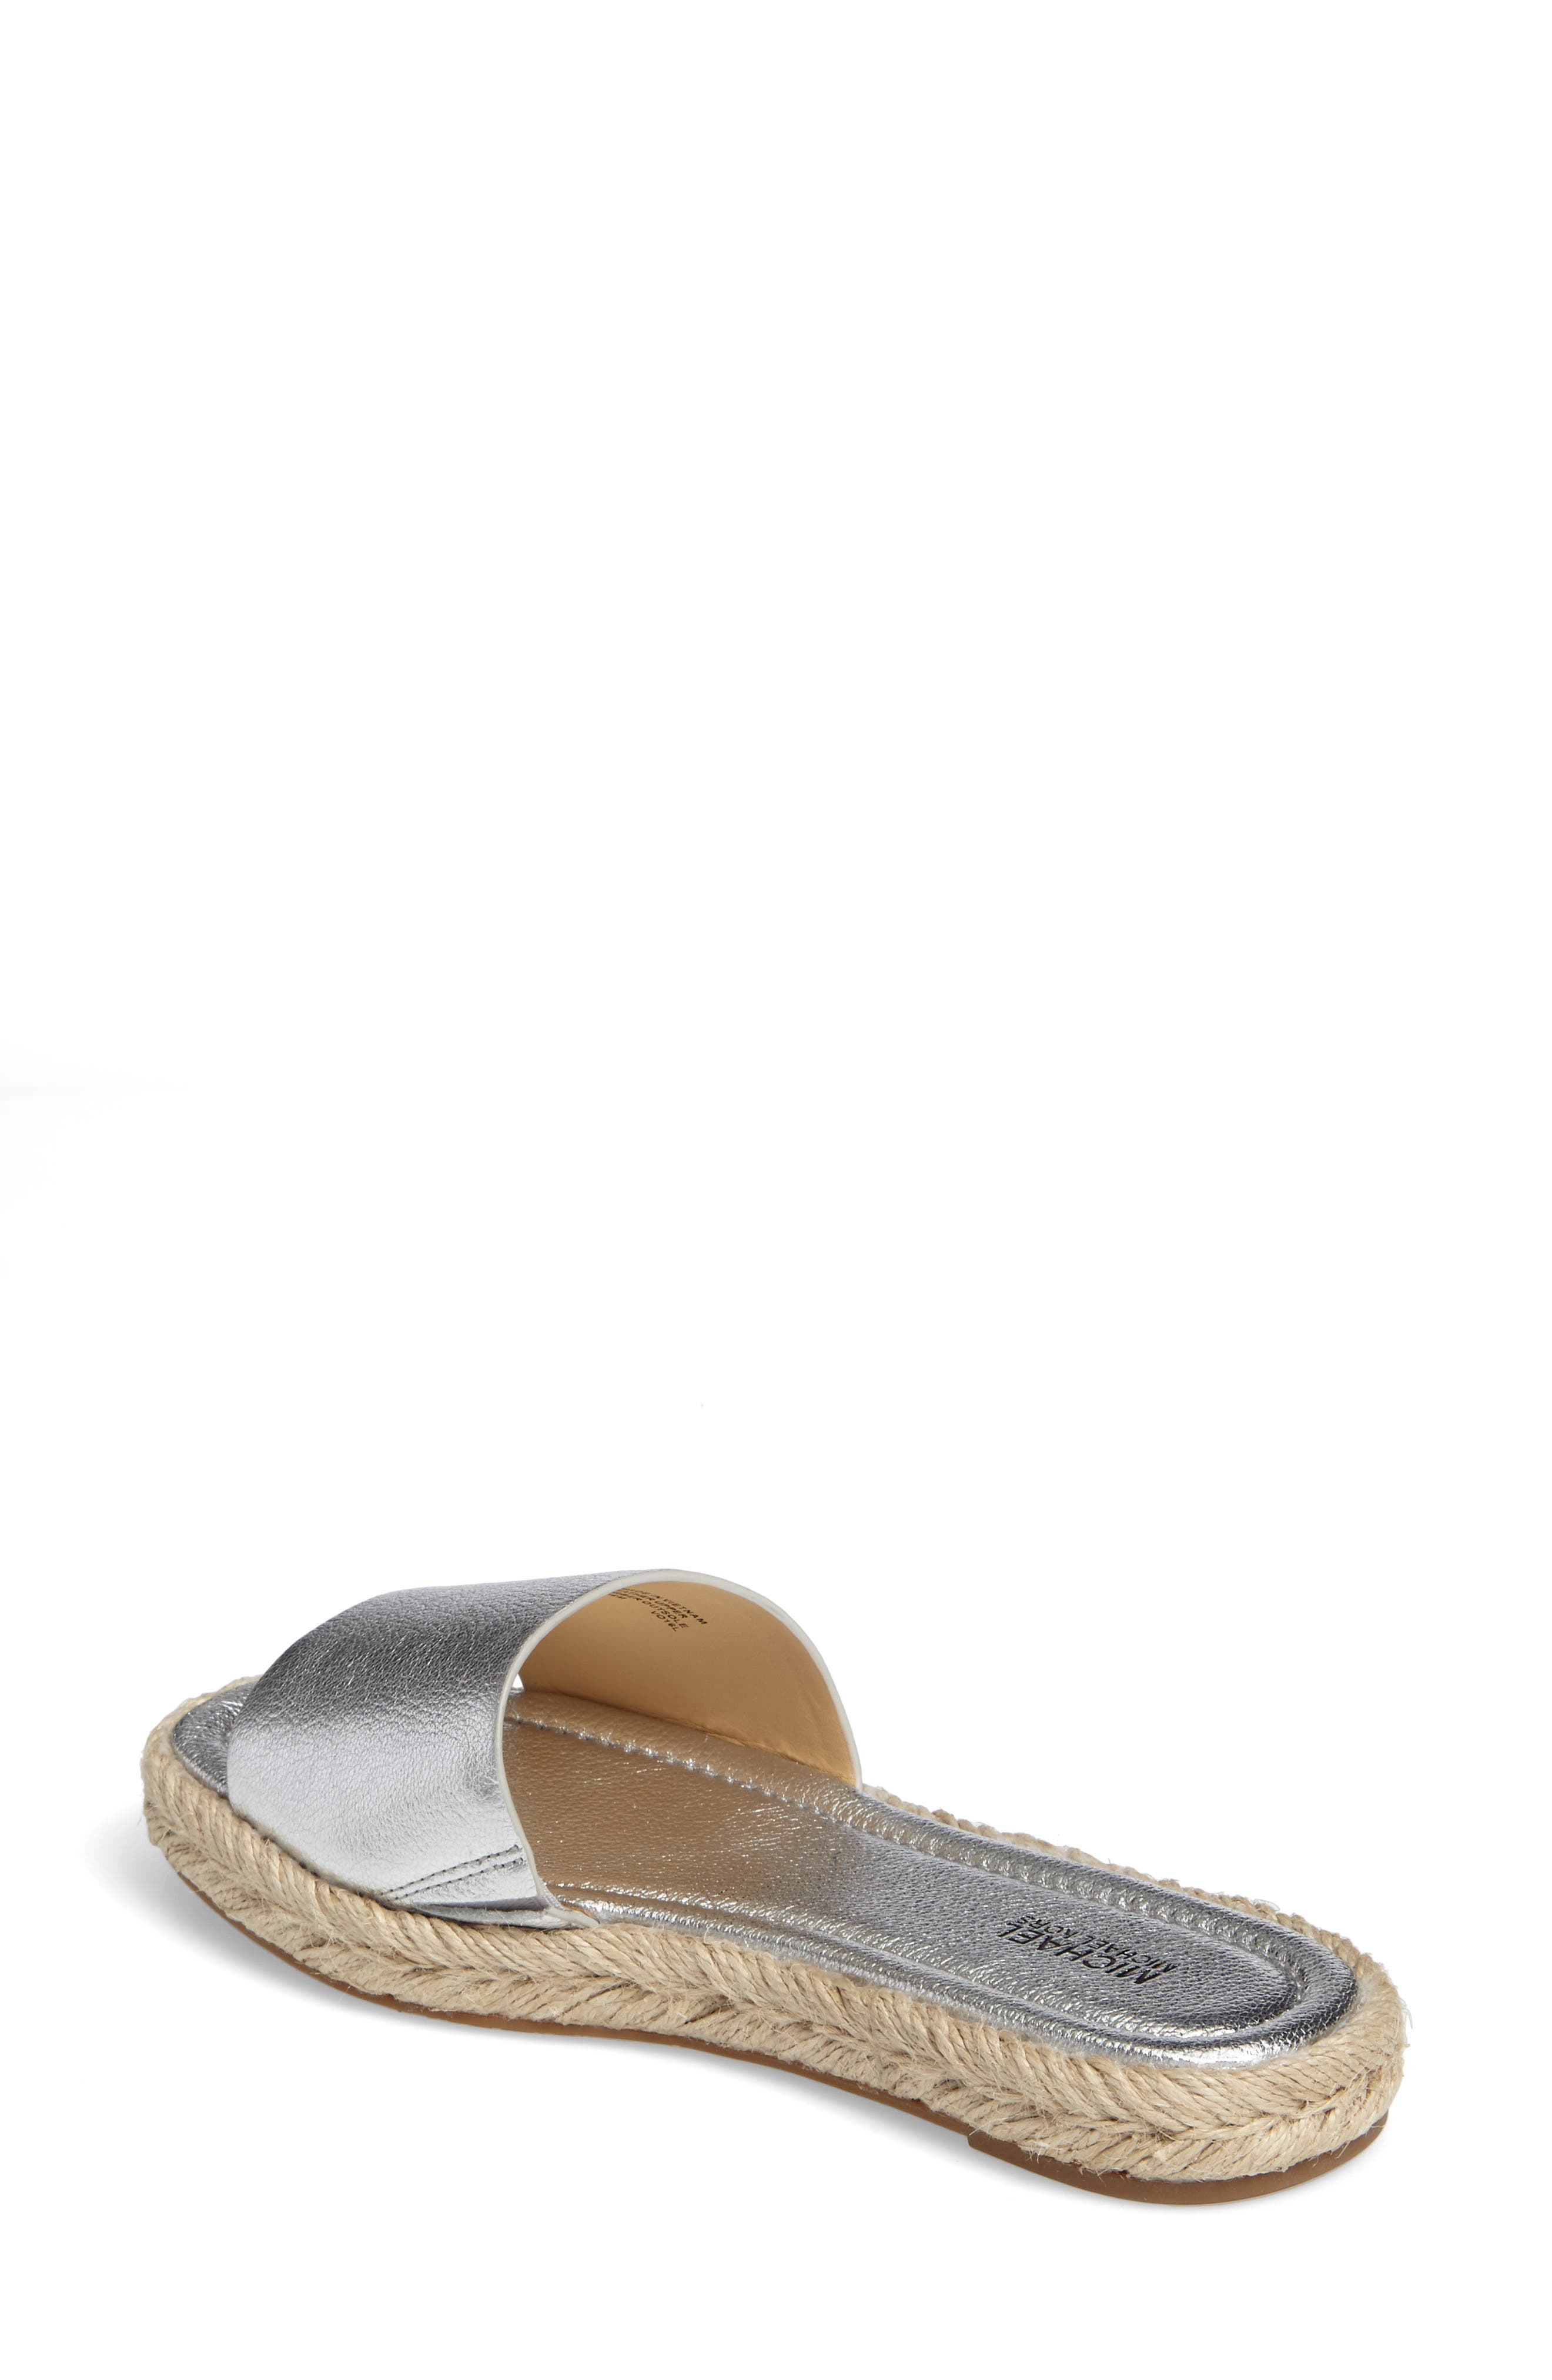 Alternate Image 2  - MICHAEL Michael Kors Dempsey Slide Sandal (Women)